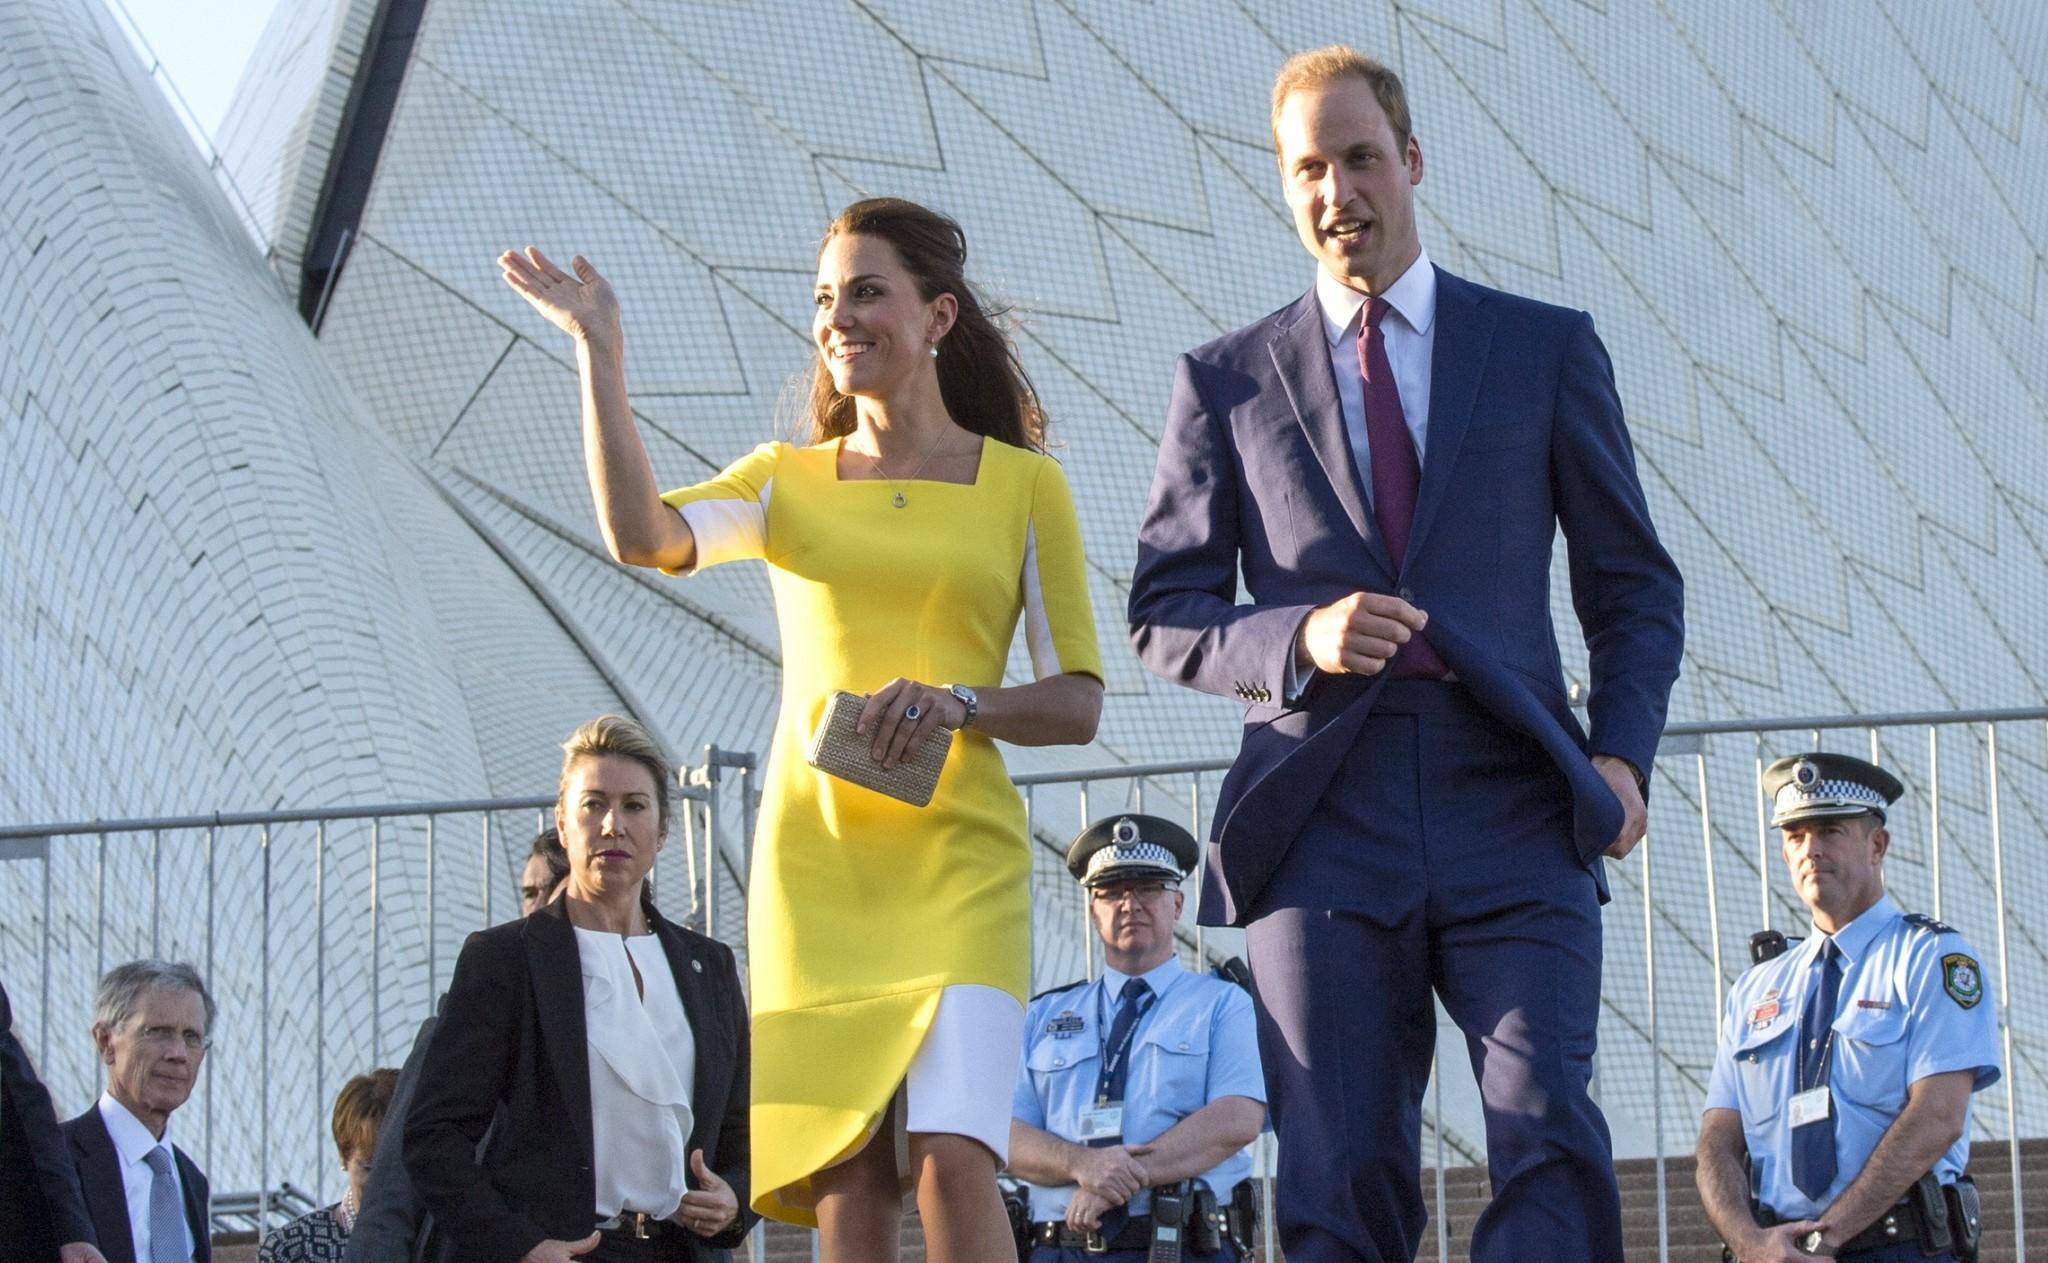 Prince William, Duke of Cambridge and Catherine, Duchess of Cambridge walk near the Sydney Opera House.